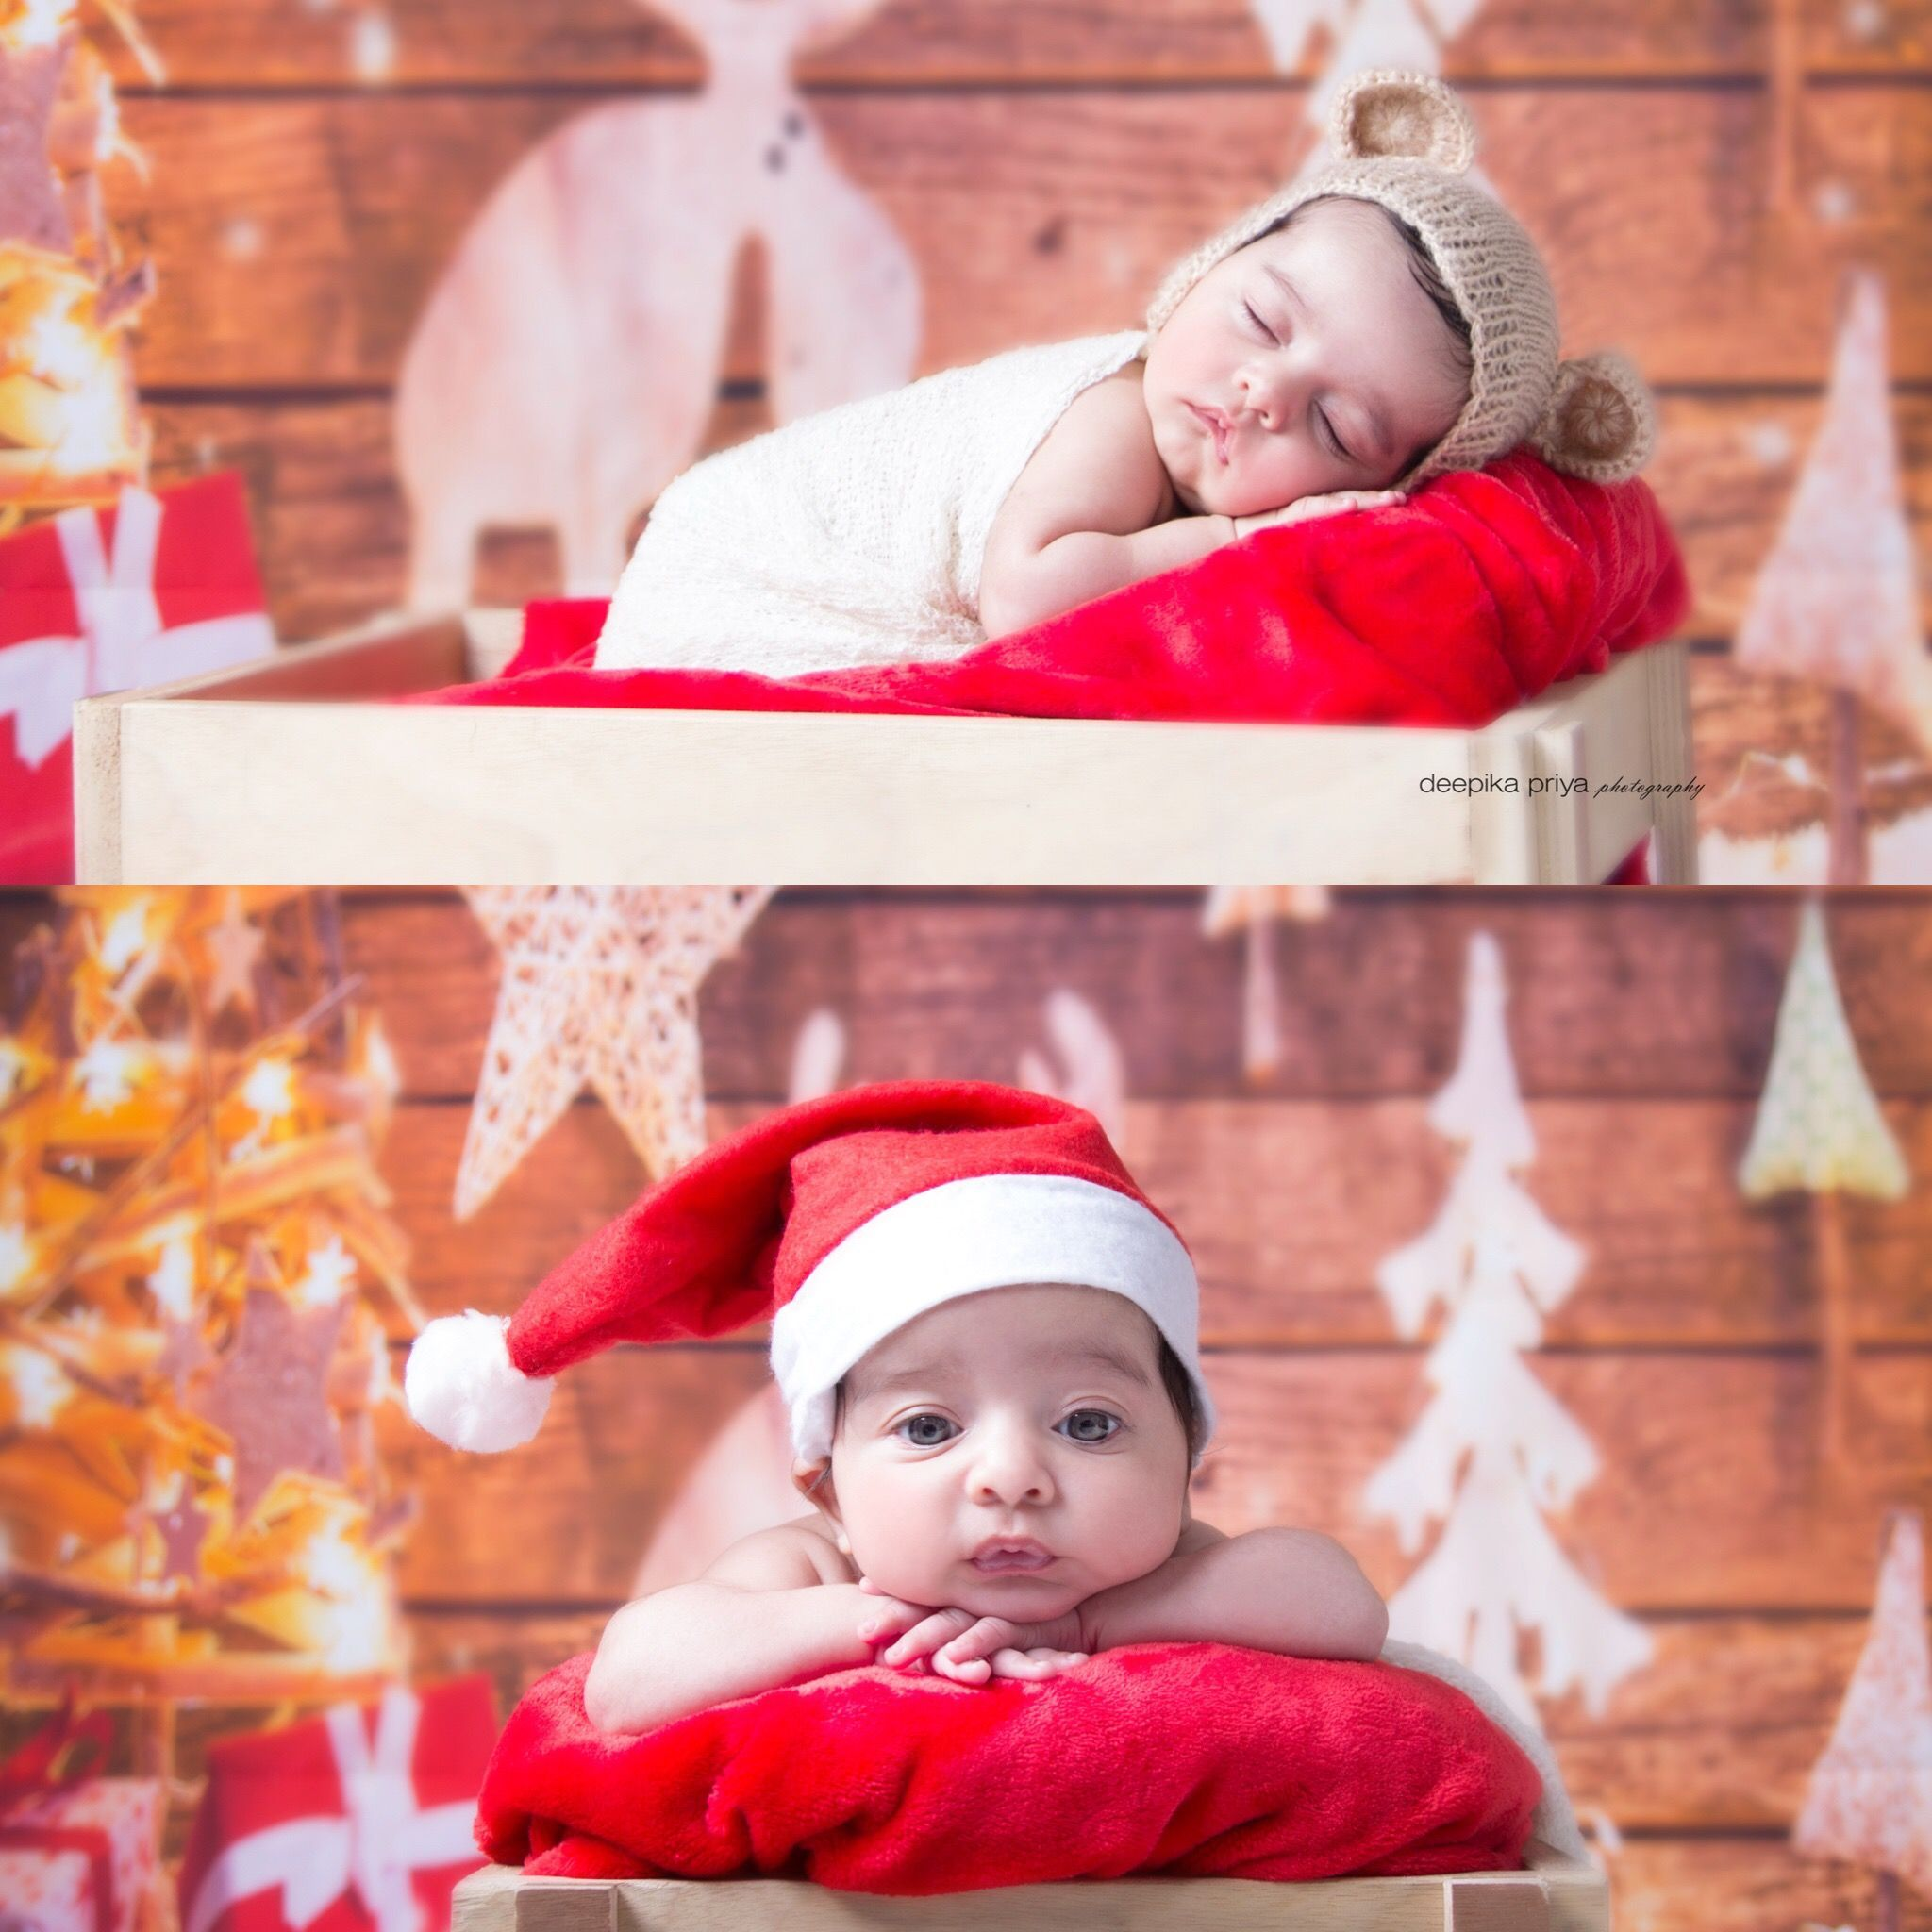 Newborn christmas set lights red newborn baby deepika priya photography deepika